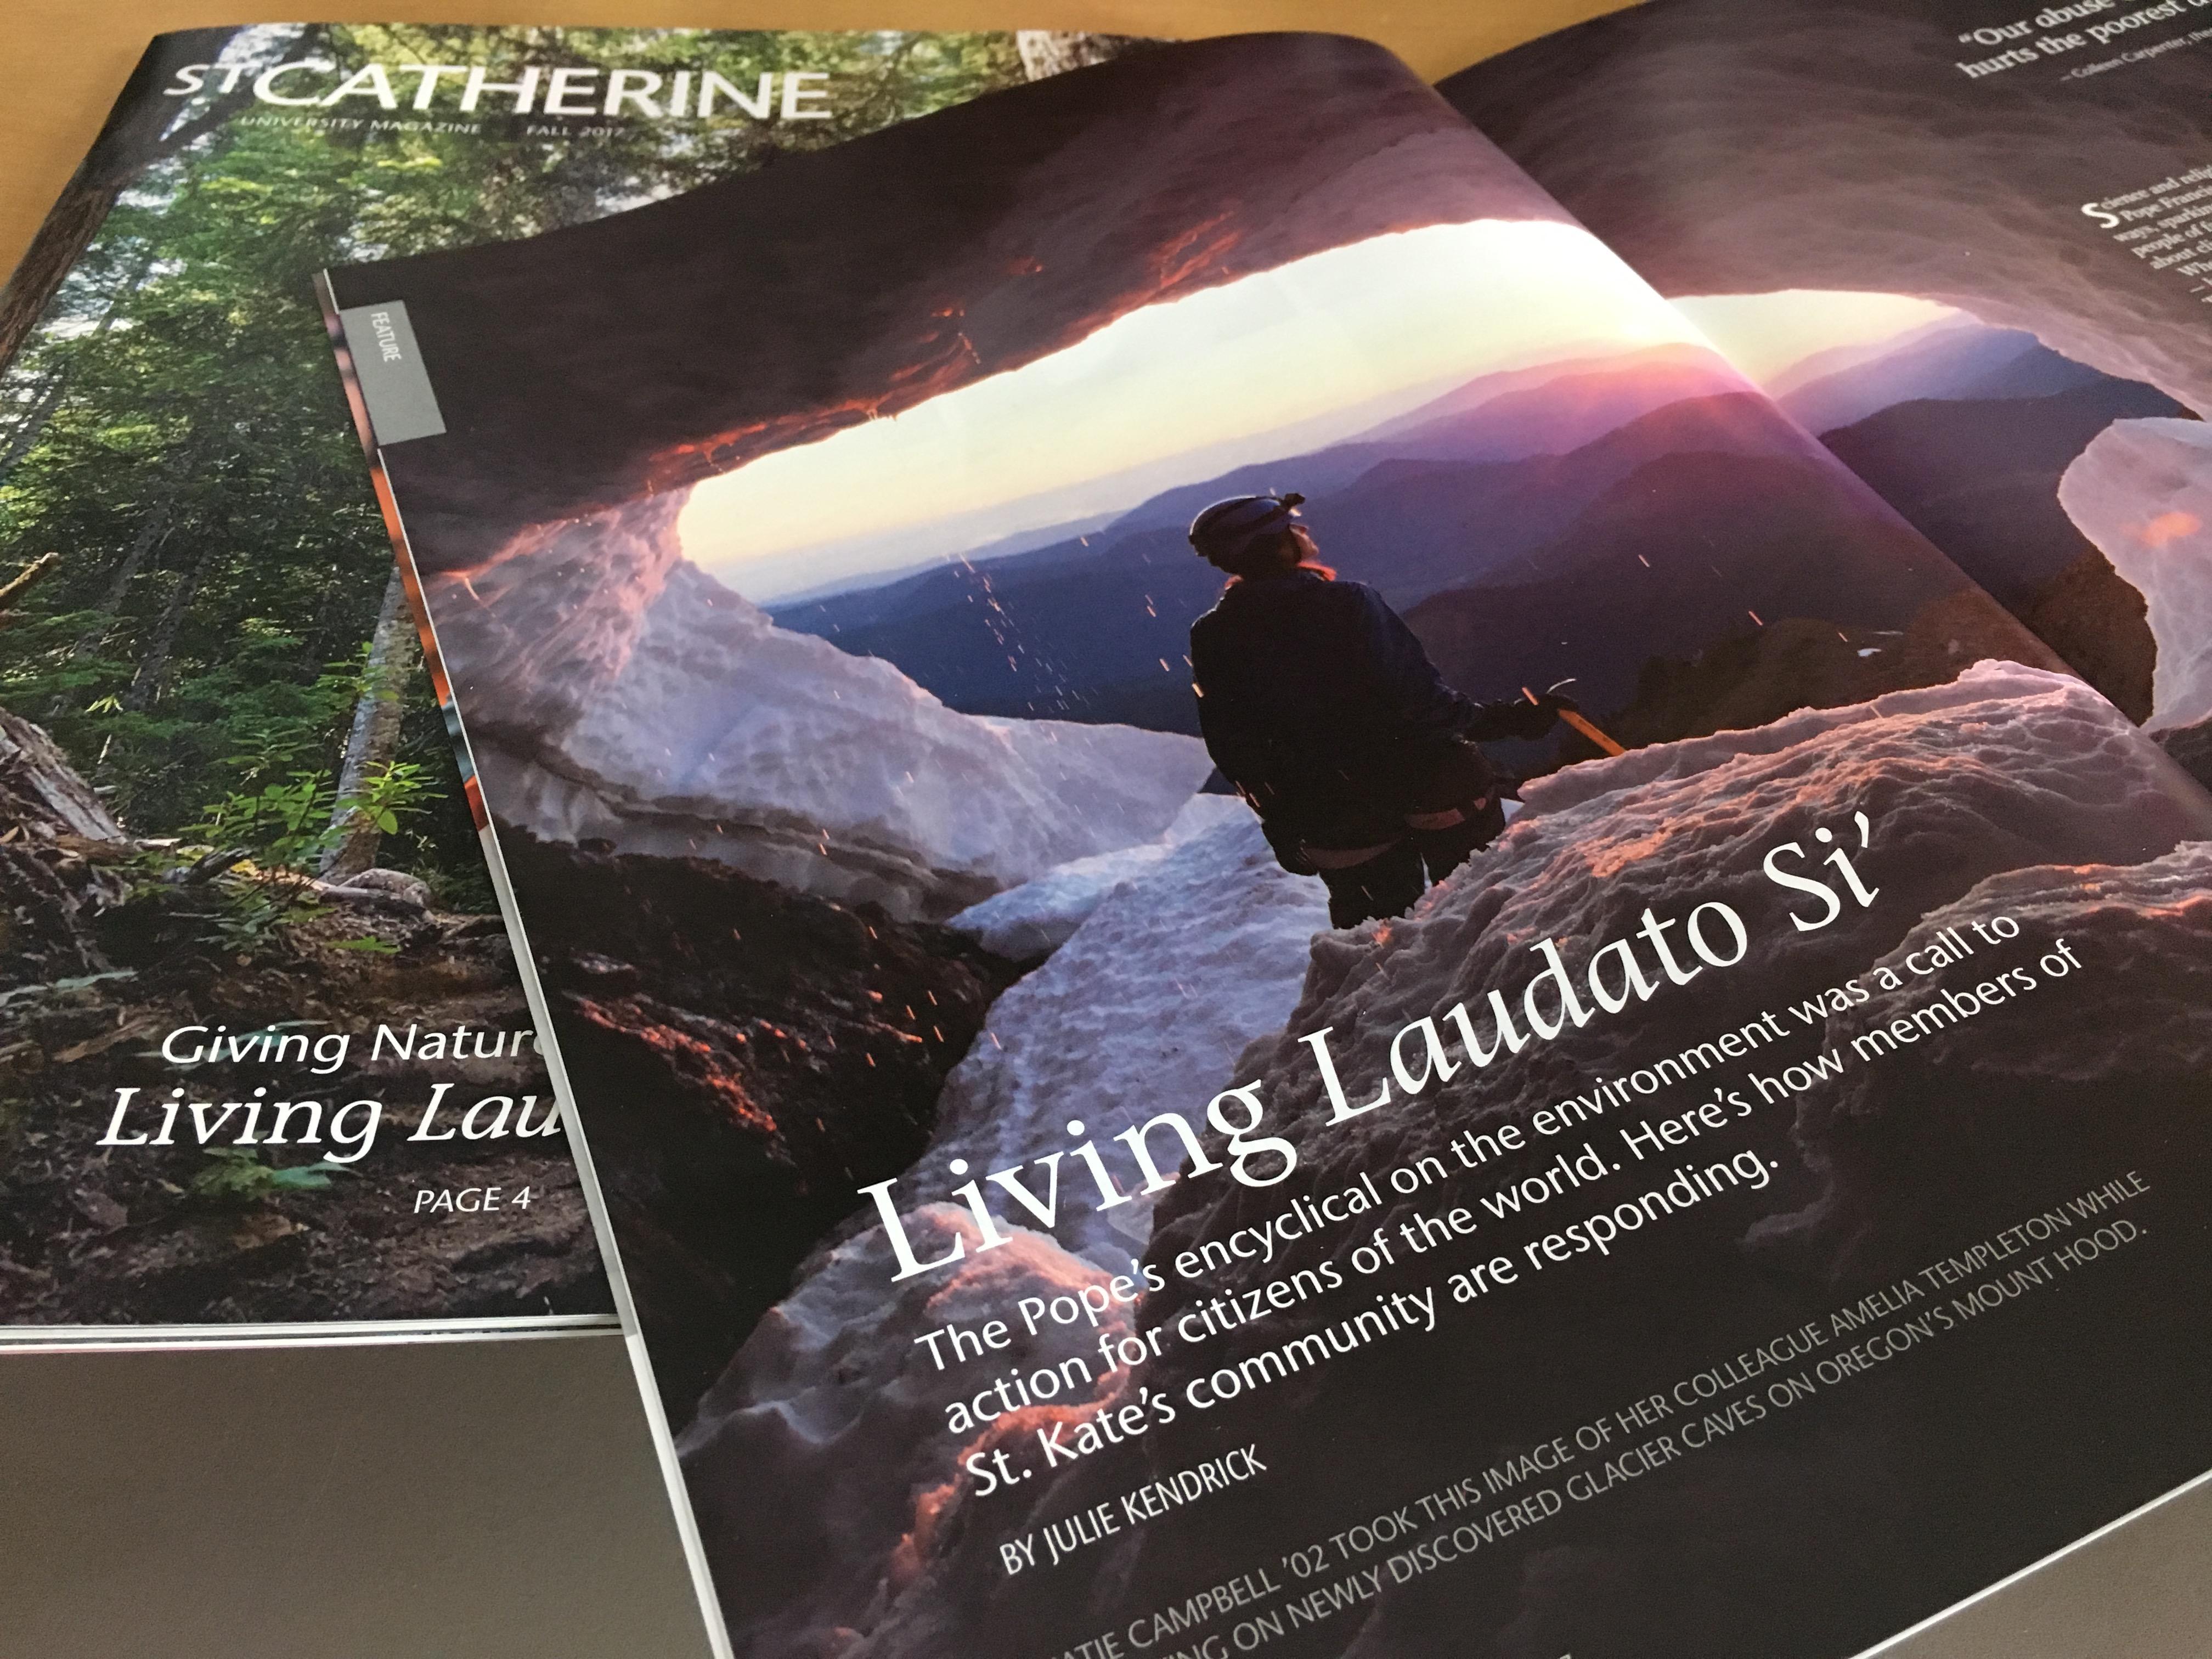 Julie kendrick for st. catherine university magazine